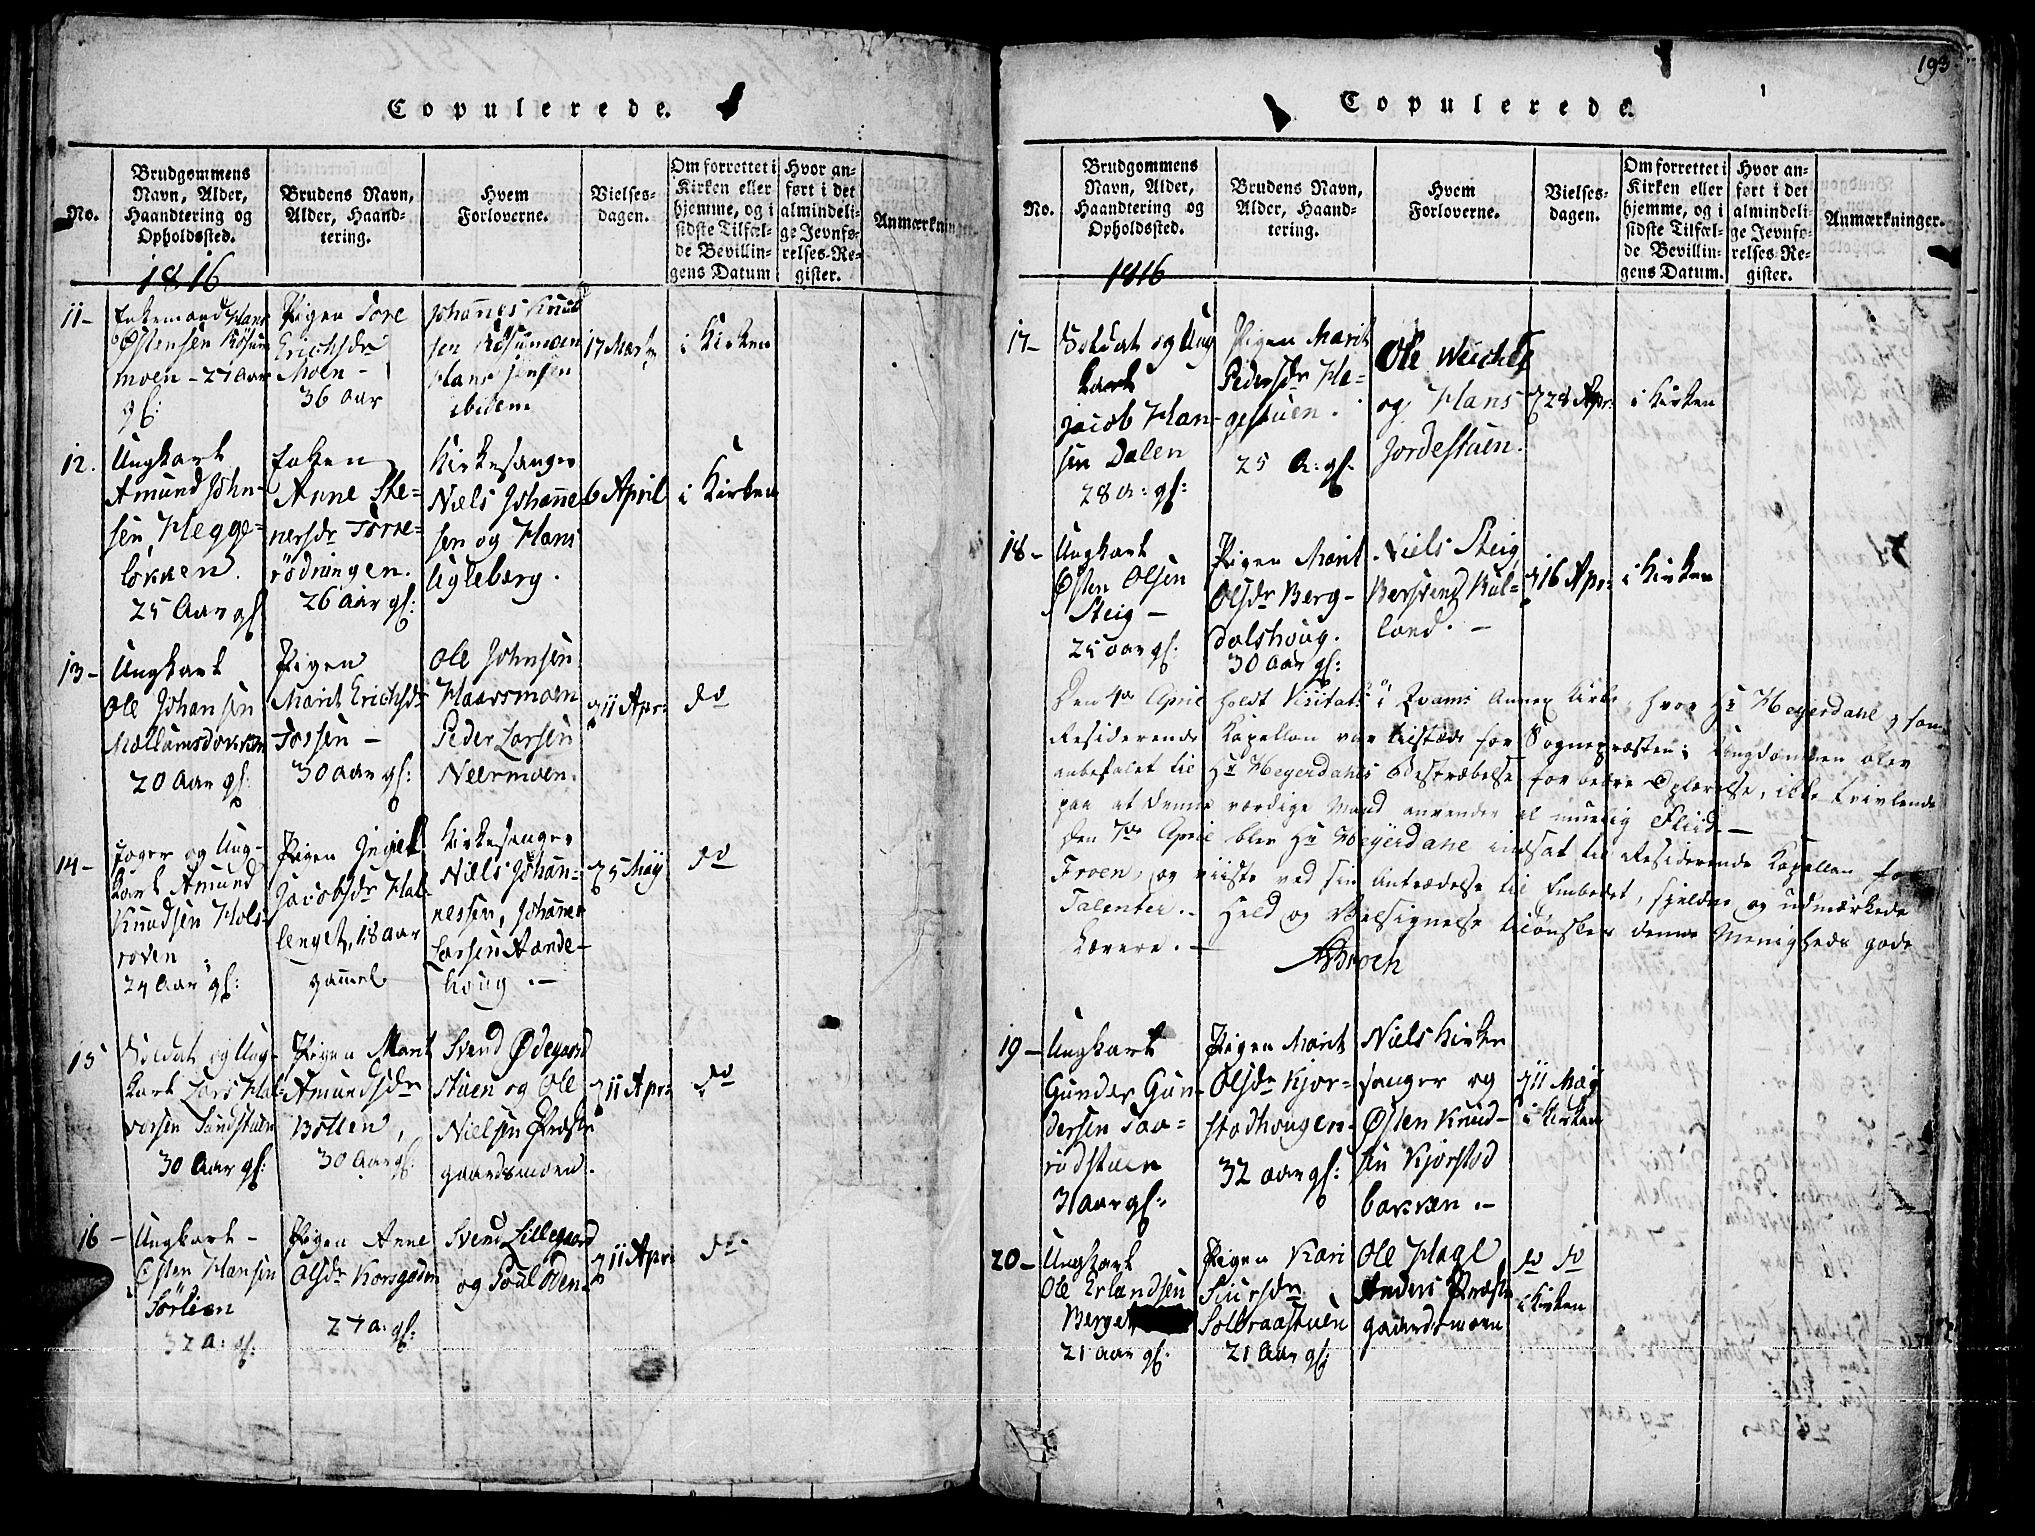 SAH, Fron prestekontor, H/Ha/Haa/L0002: Ministerialbok nr. 2, 1816-1827, s. 193